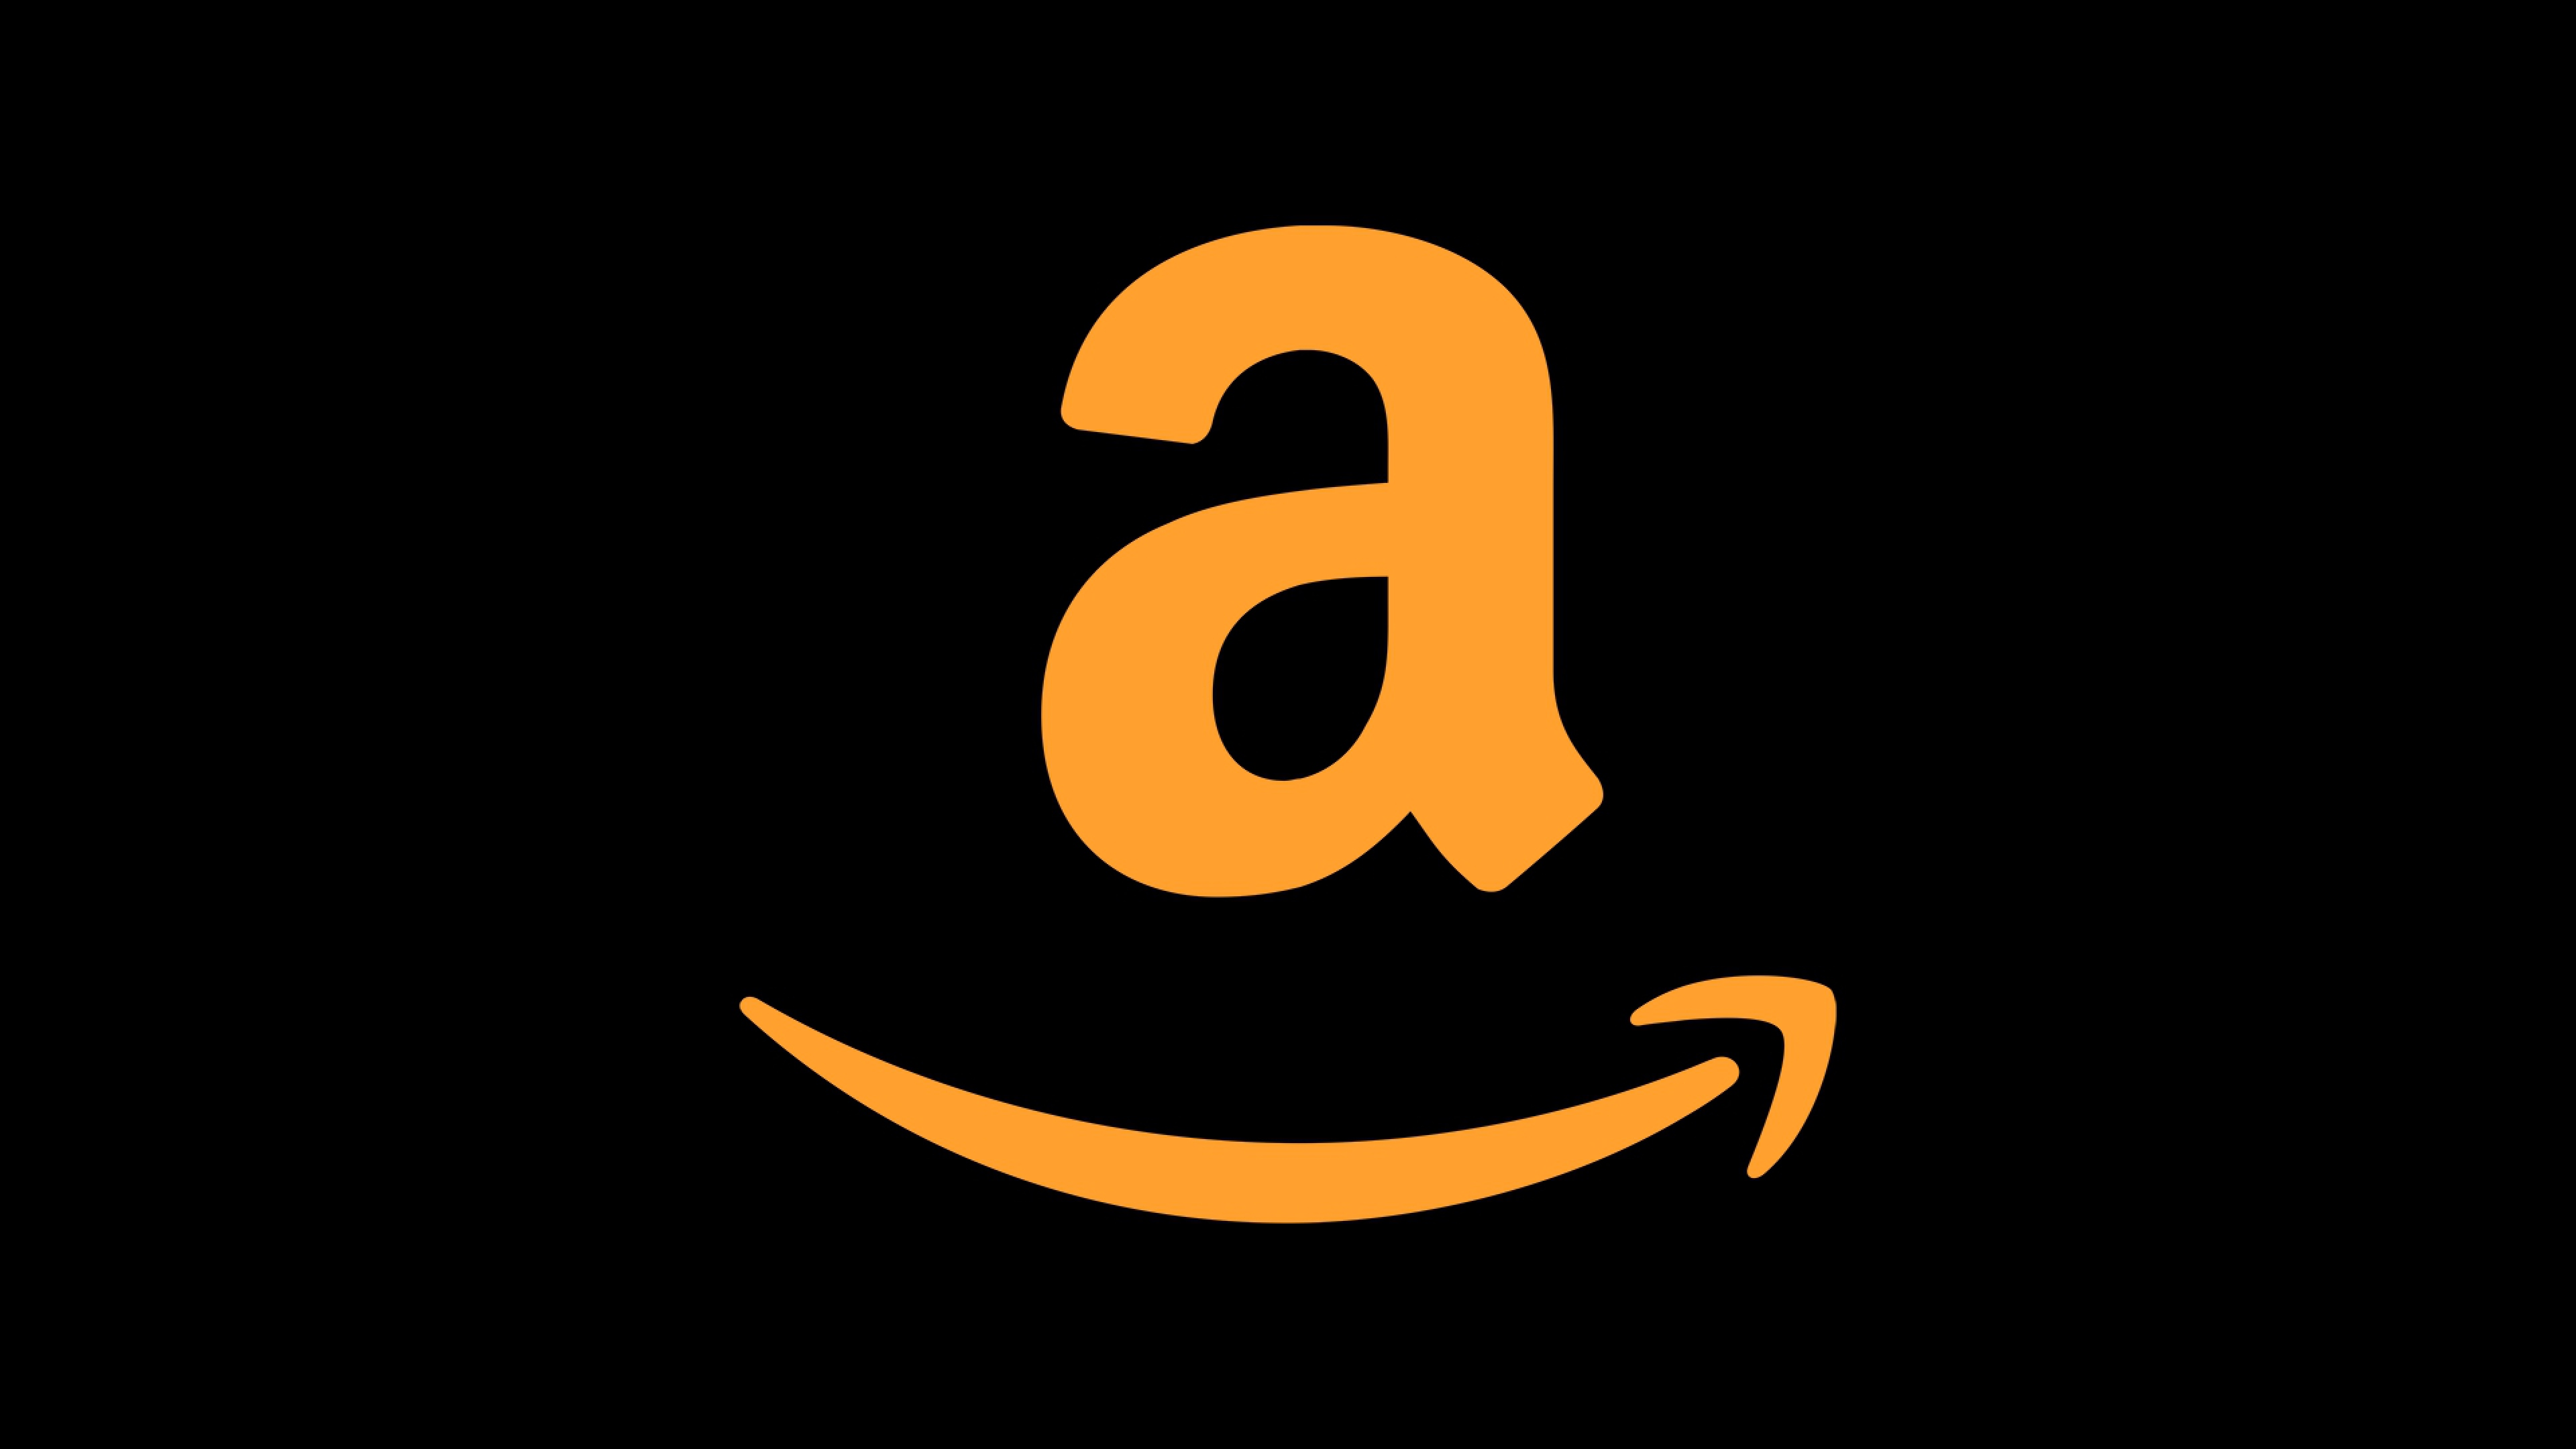 Amazon 4k Logo, HD Logo, 4k Wallpapers, Images, Backgrounds.